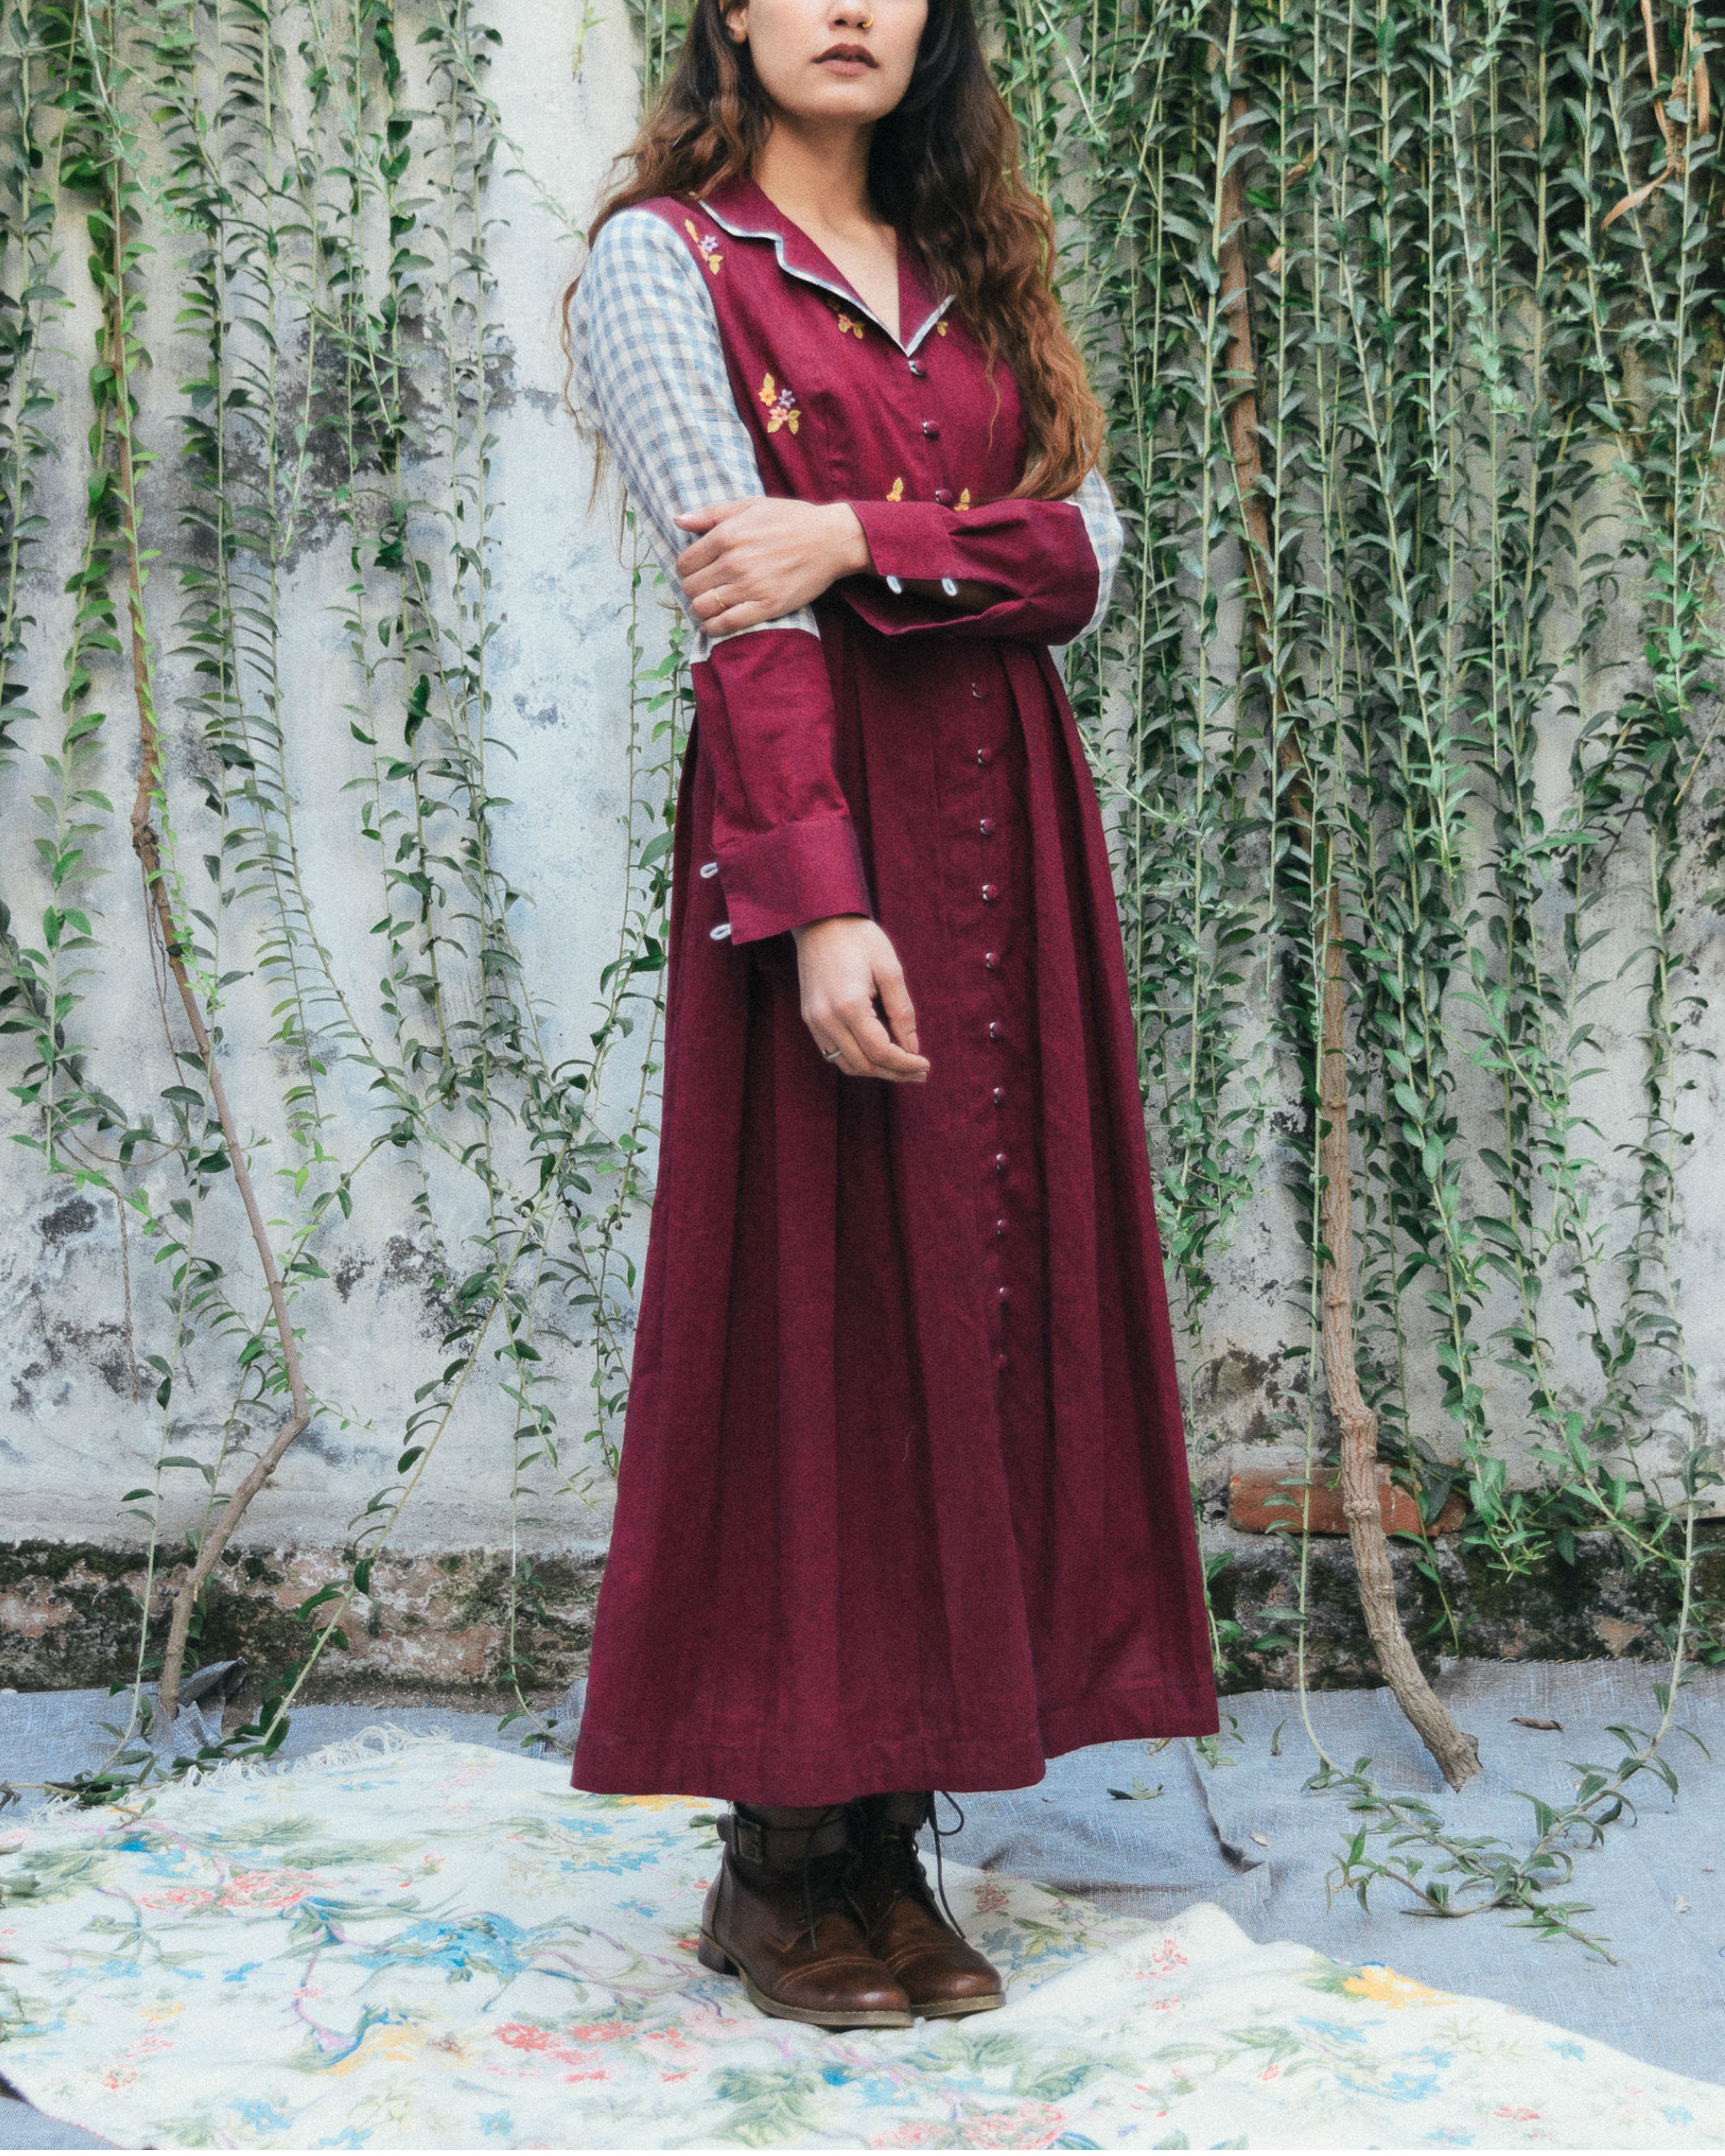 Merlot evening jacket dress